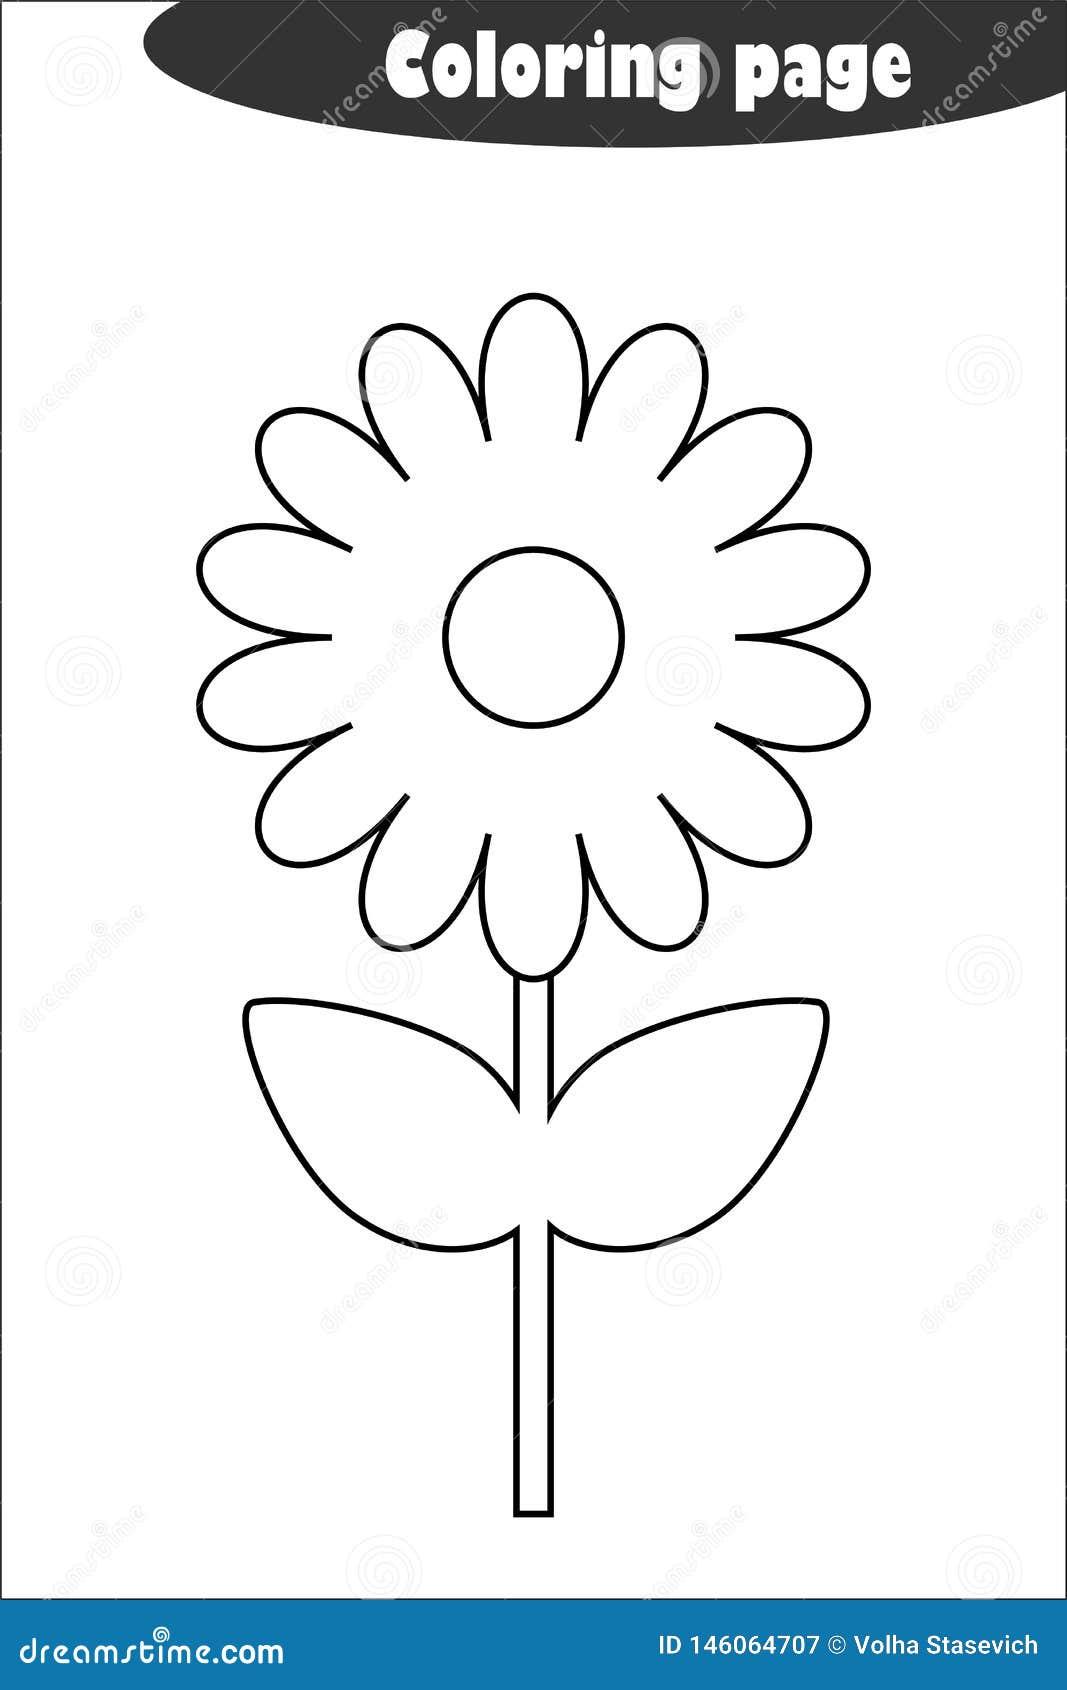 flower coloring pages for adults   Pagine di esercizi, Scienza per ...   1689x1067